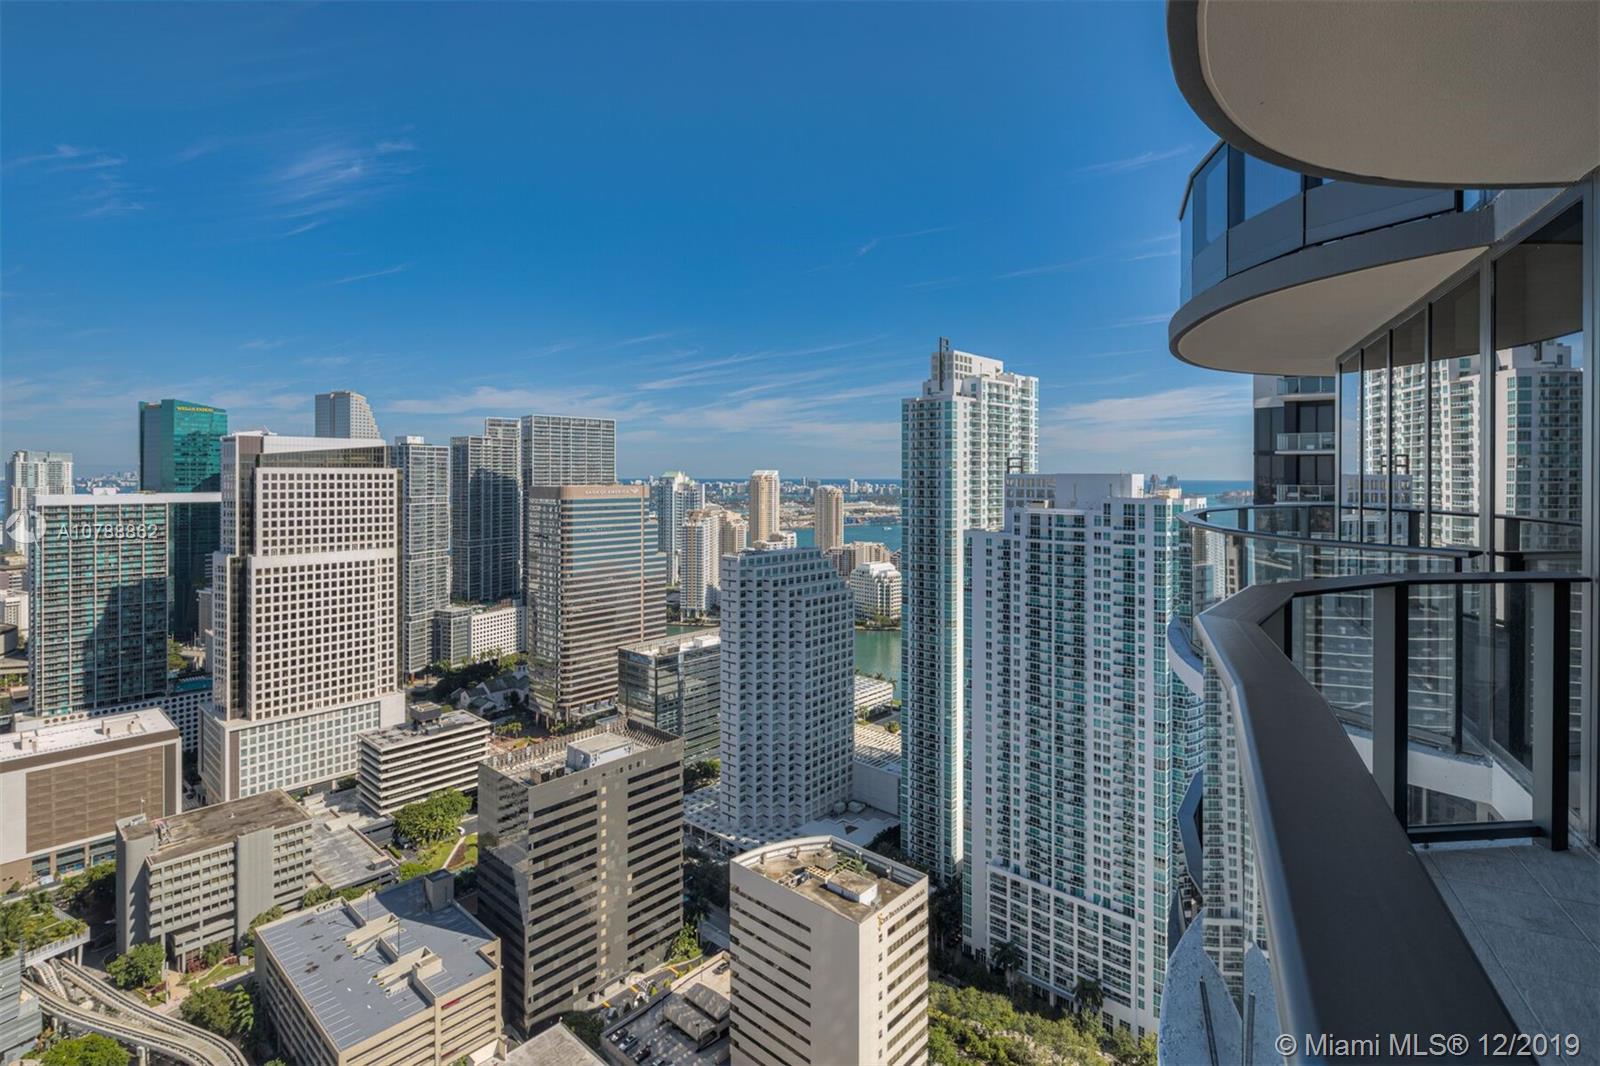 Brickell FlatIron #4715 - 1000 Brickell Plaza #4715, Miami, FL 33131